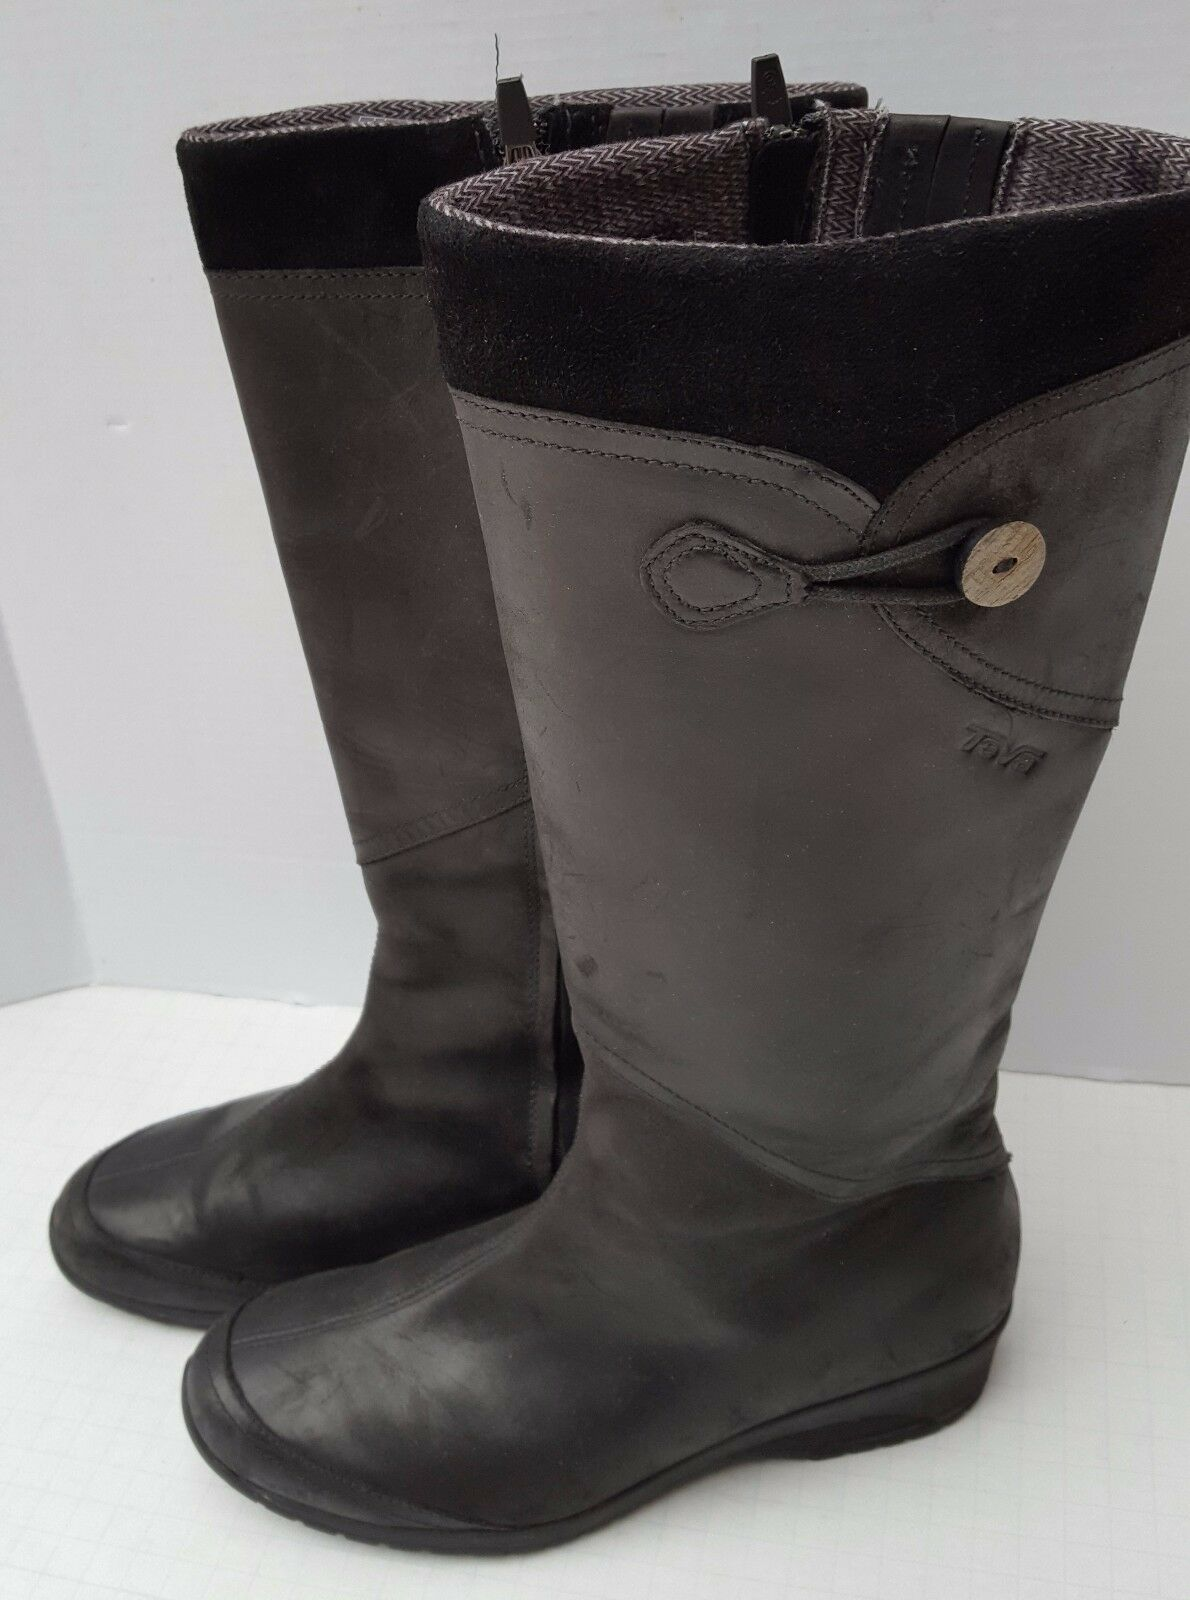 Teva 4325 Boots Wedge Black Leather Knee High Wedge Boots Full Zipper Waterproof 9 US 7.5 40 26cab8